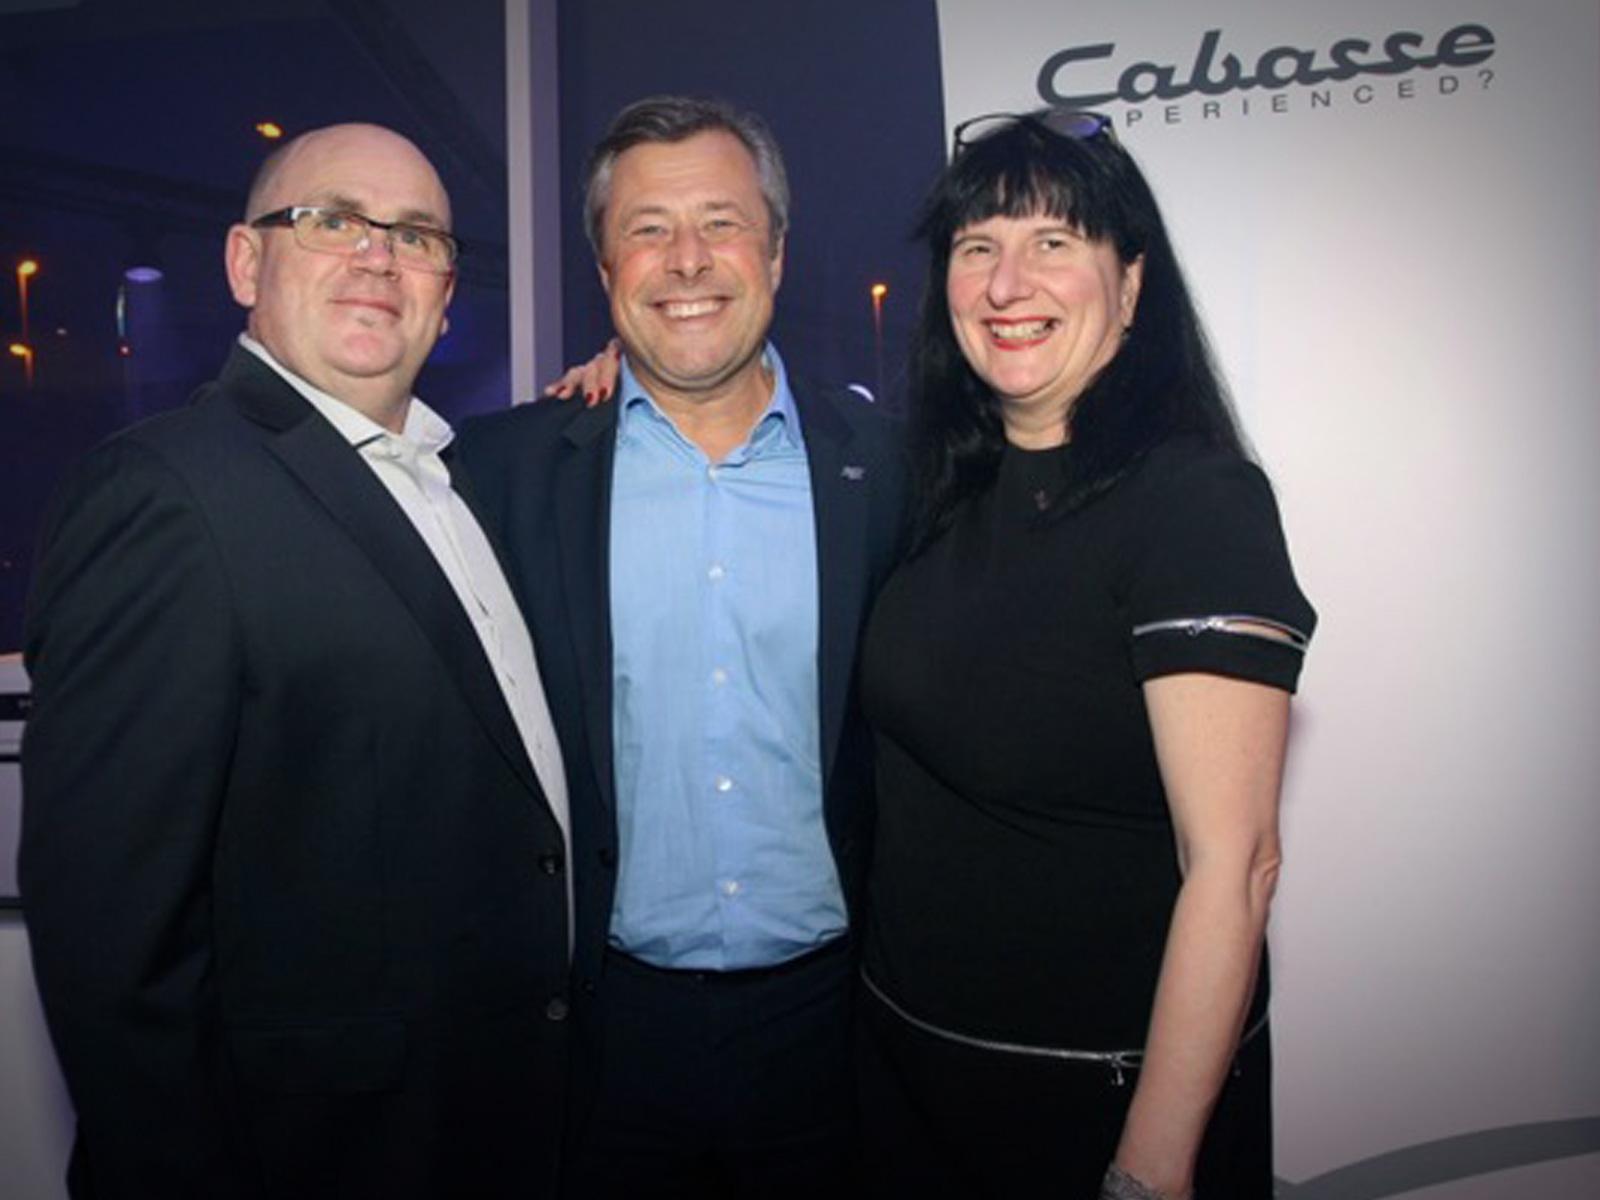 Patrick Van Moer (links), z'n echtgenote Martine Van Uffelen en Frédéric Lebreton (International Sales & Marketing Director Cabasse)